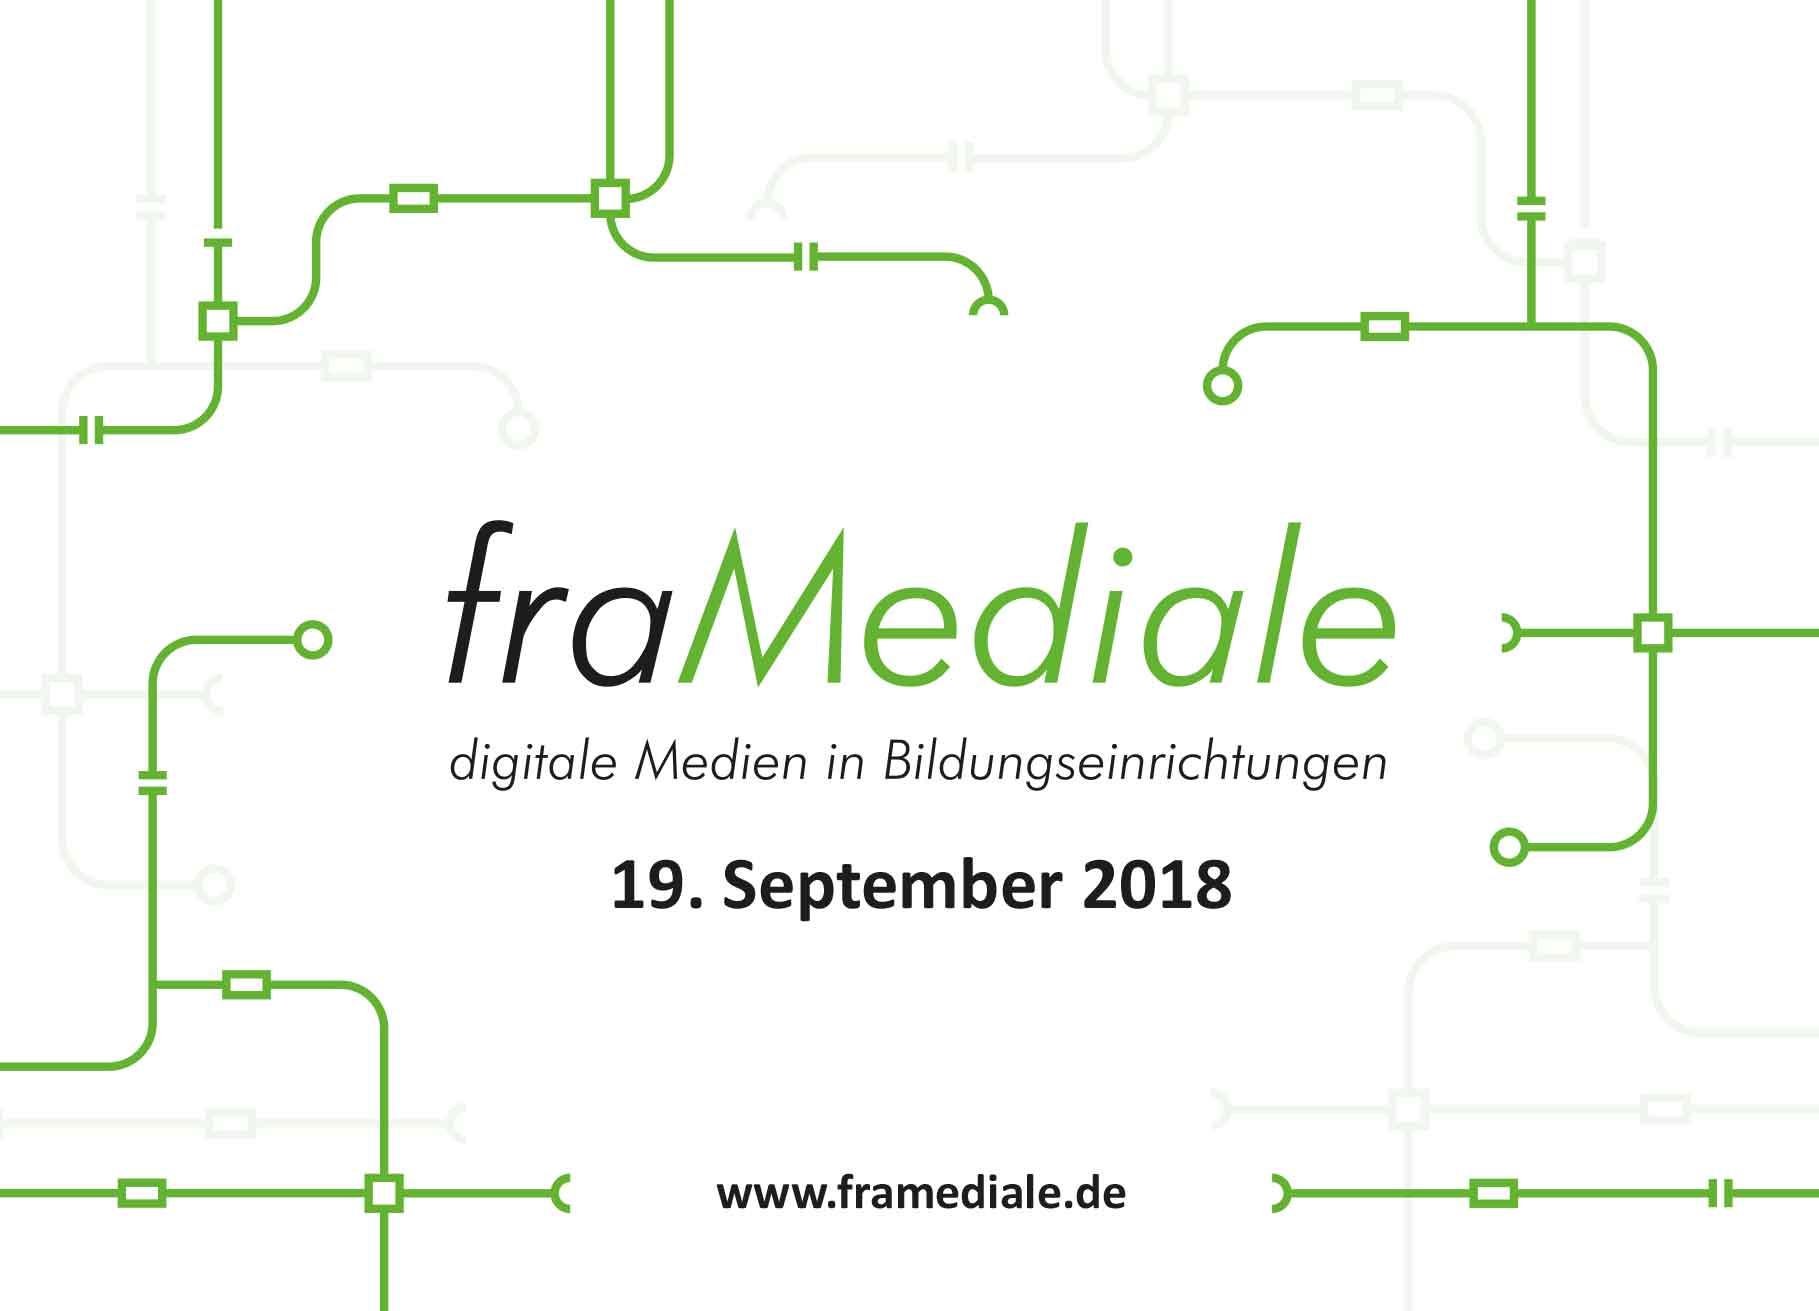 fraMediale2018